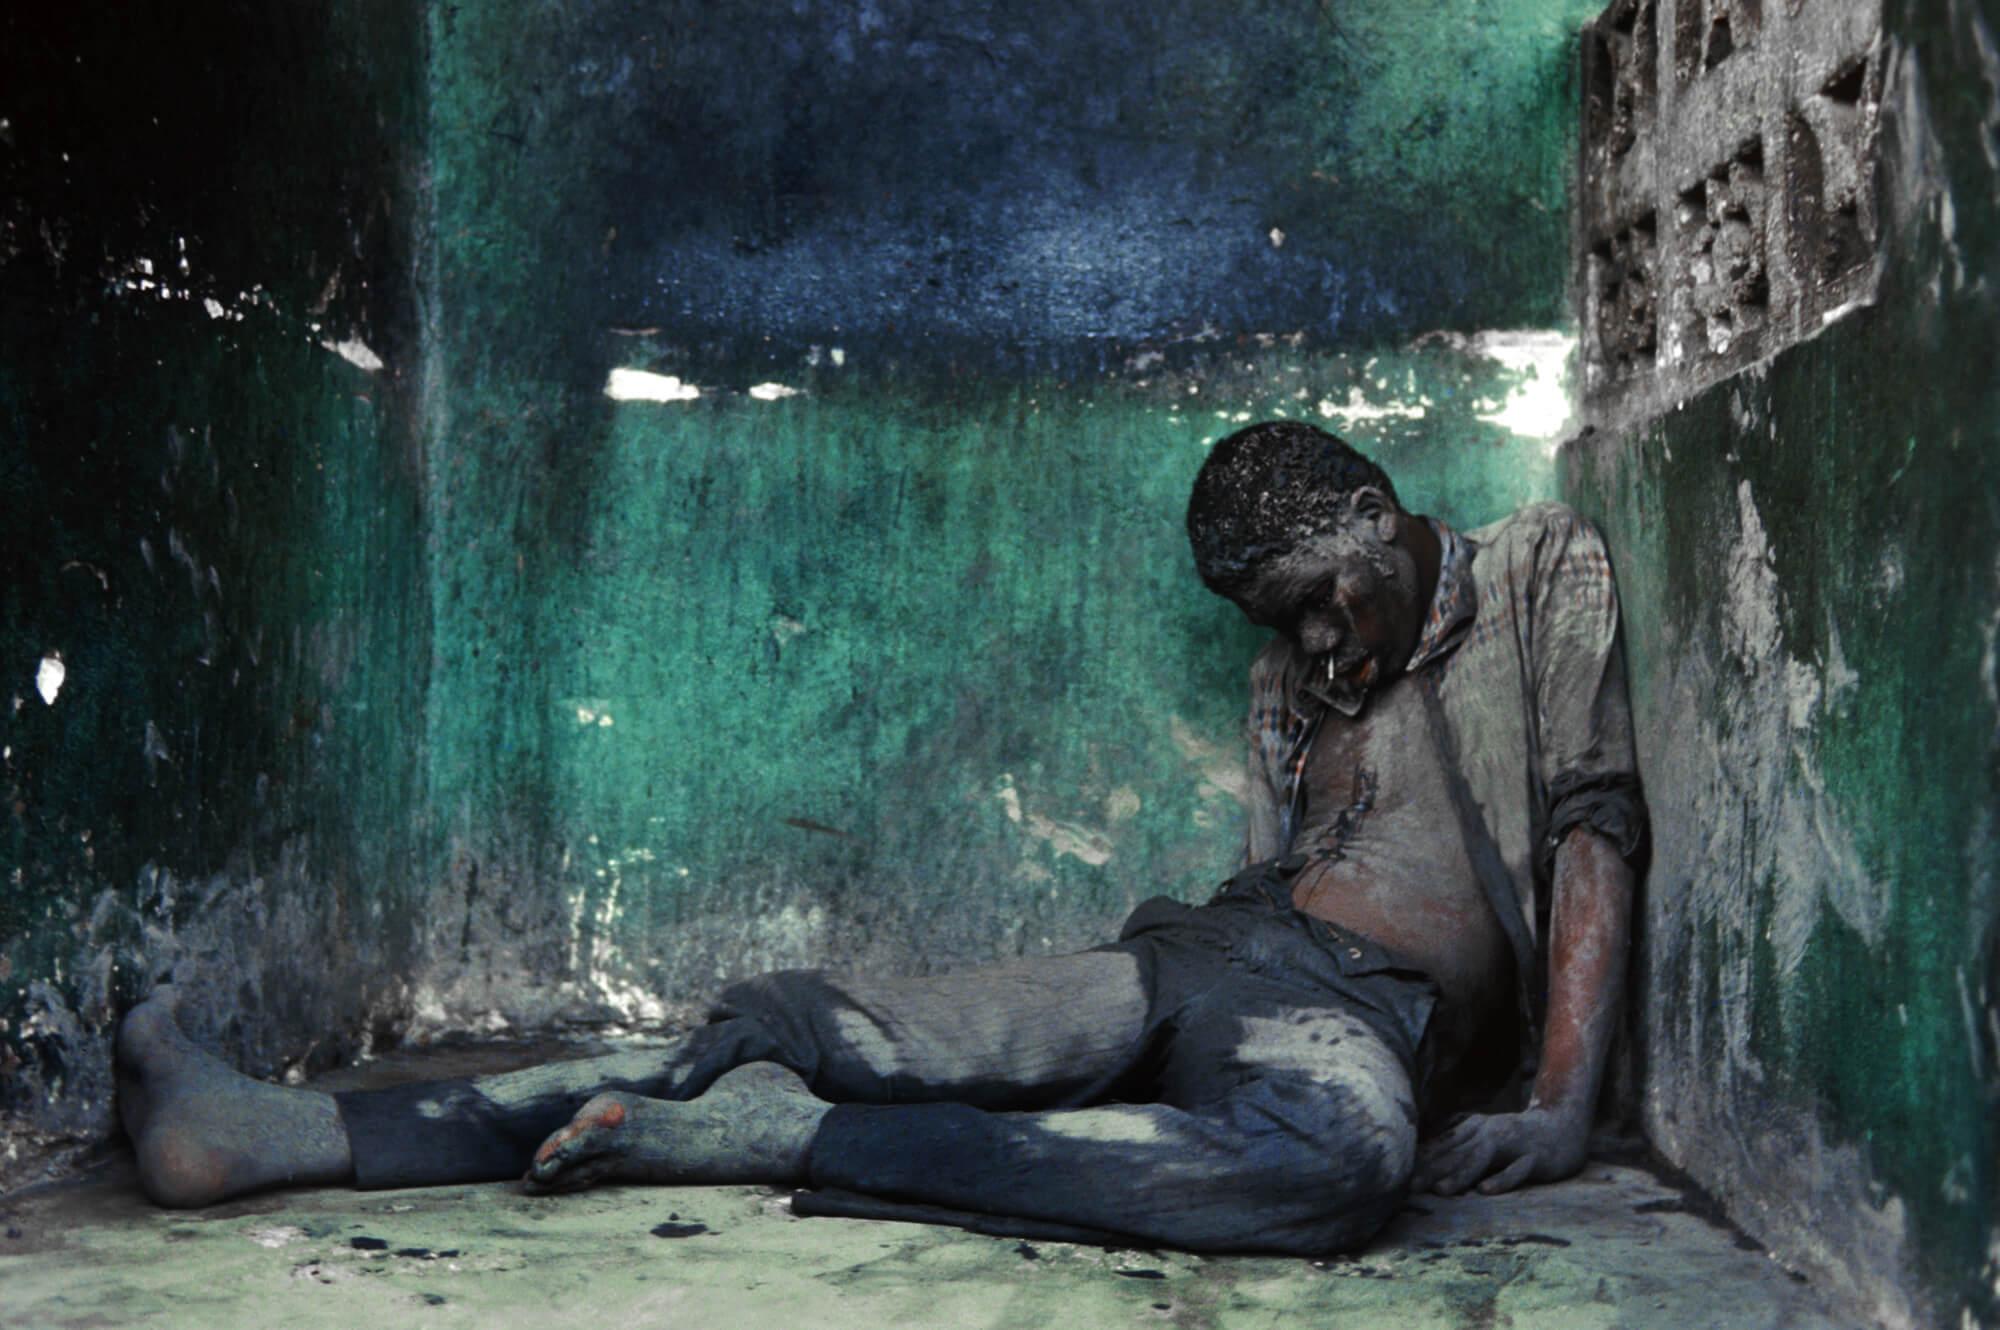 Steber_Haiti_Dead-Blue-Man_Politics